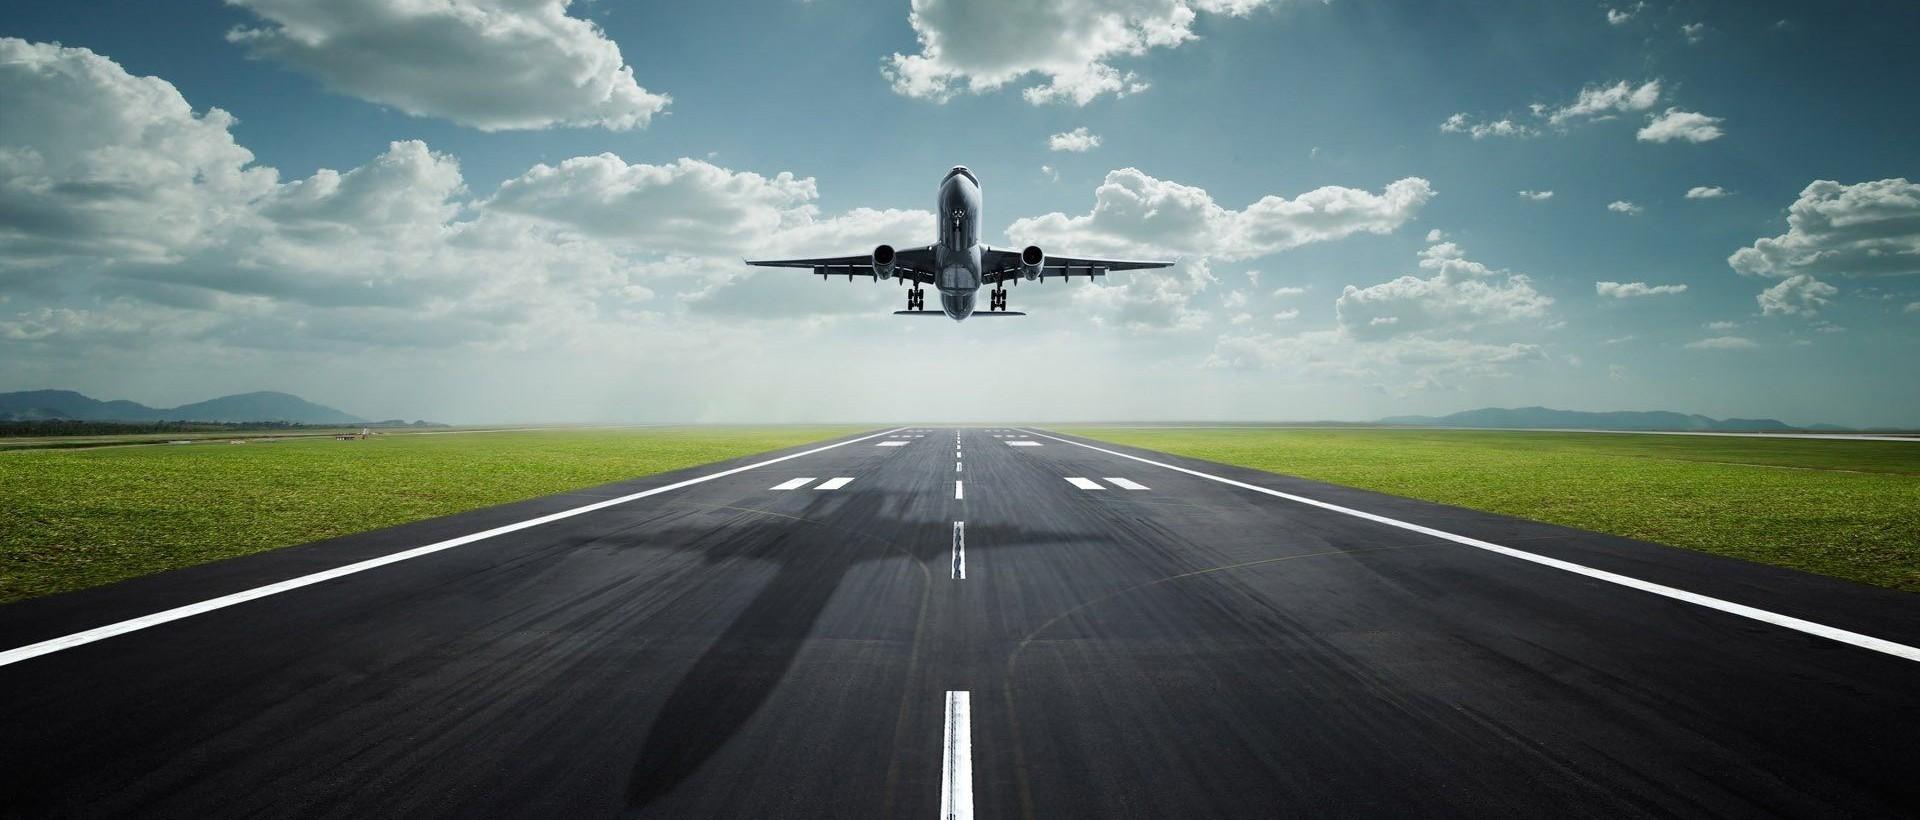 takeoff aircraft.jpg